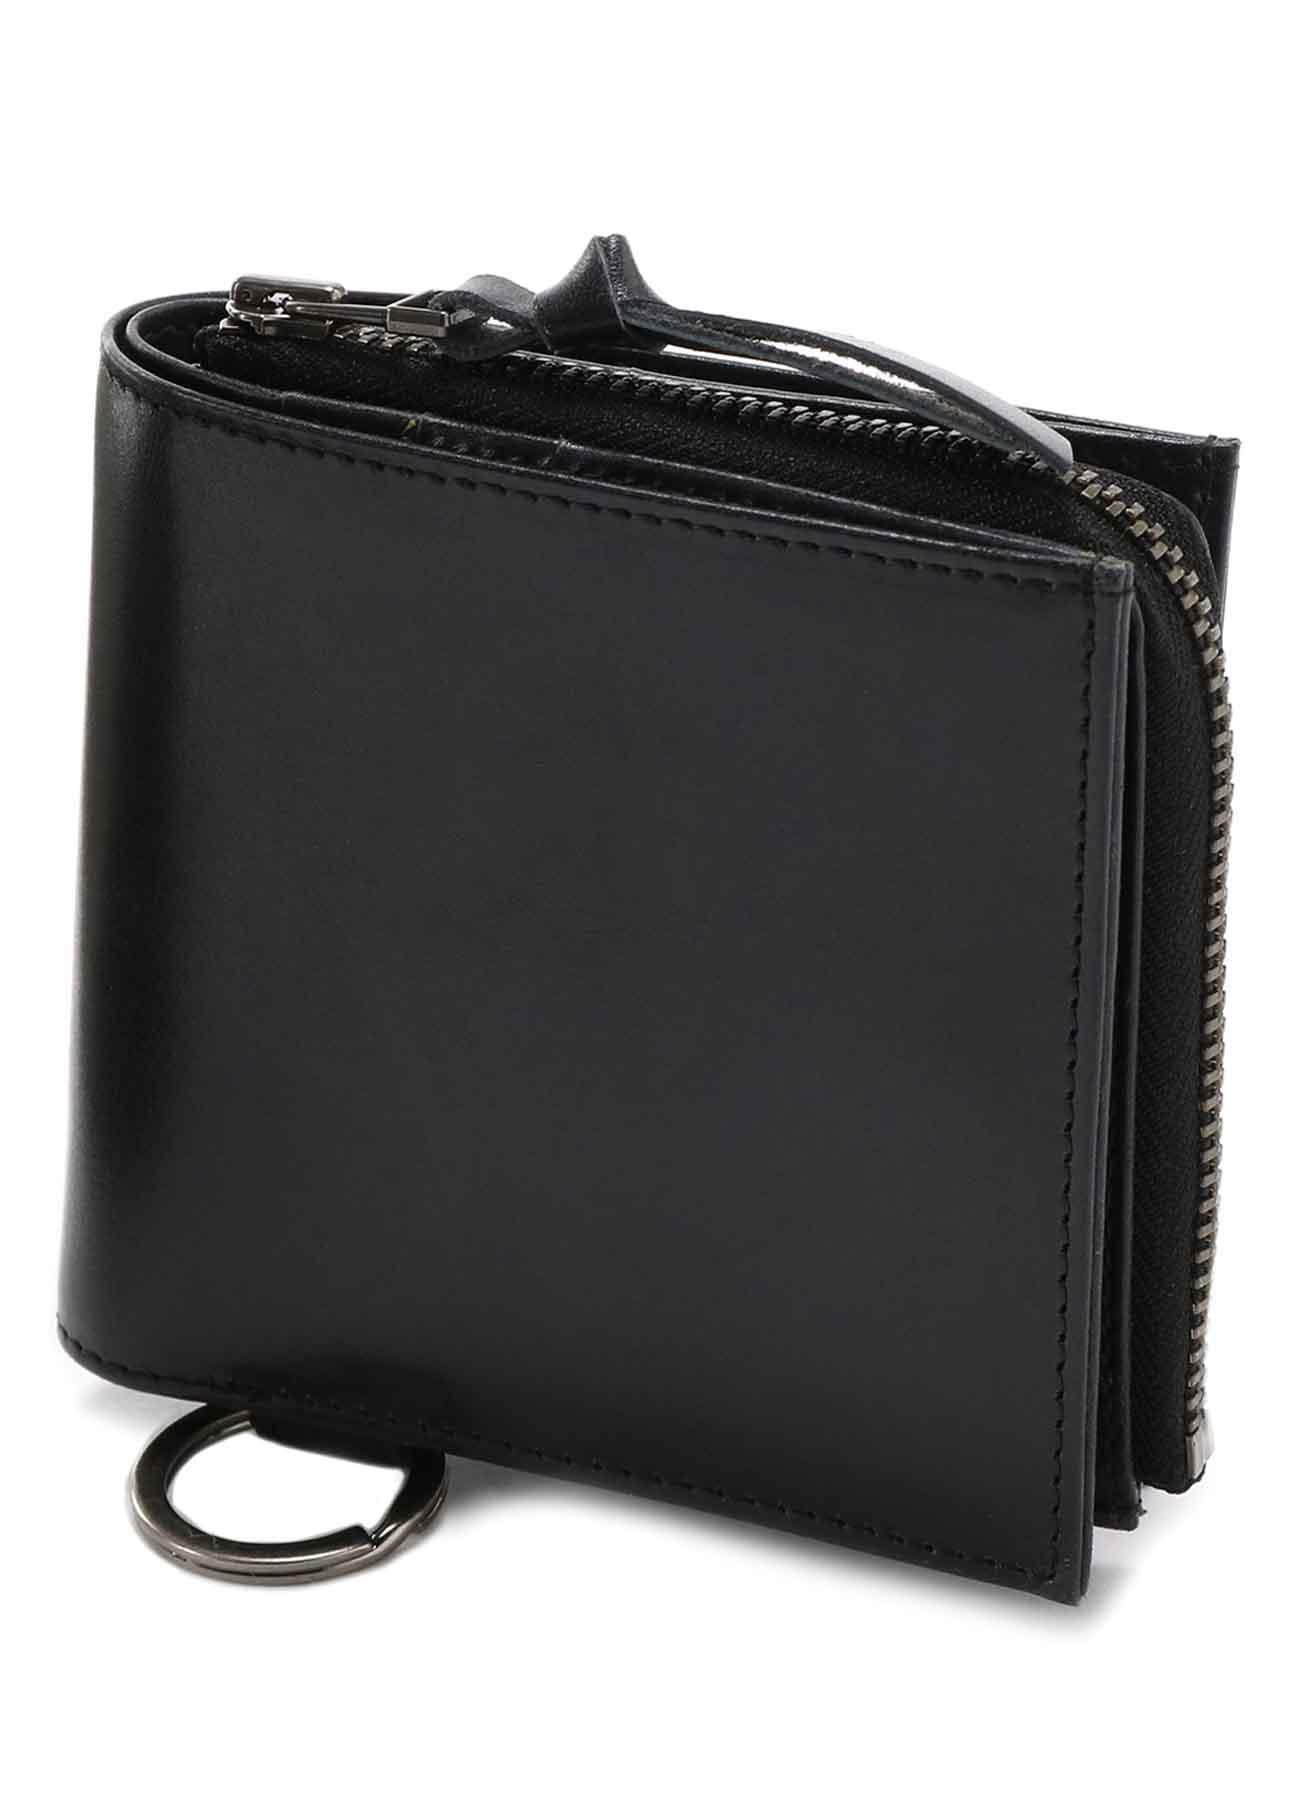 Cow Leather 2WAY Detachable Mini Wallet